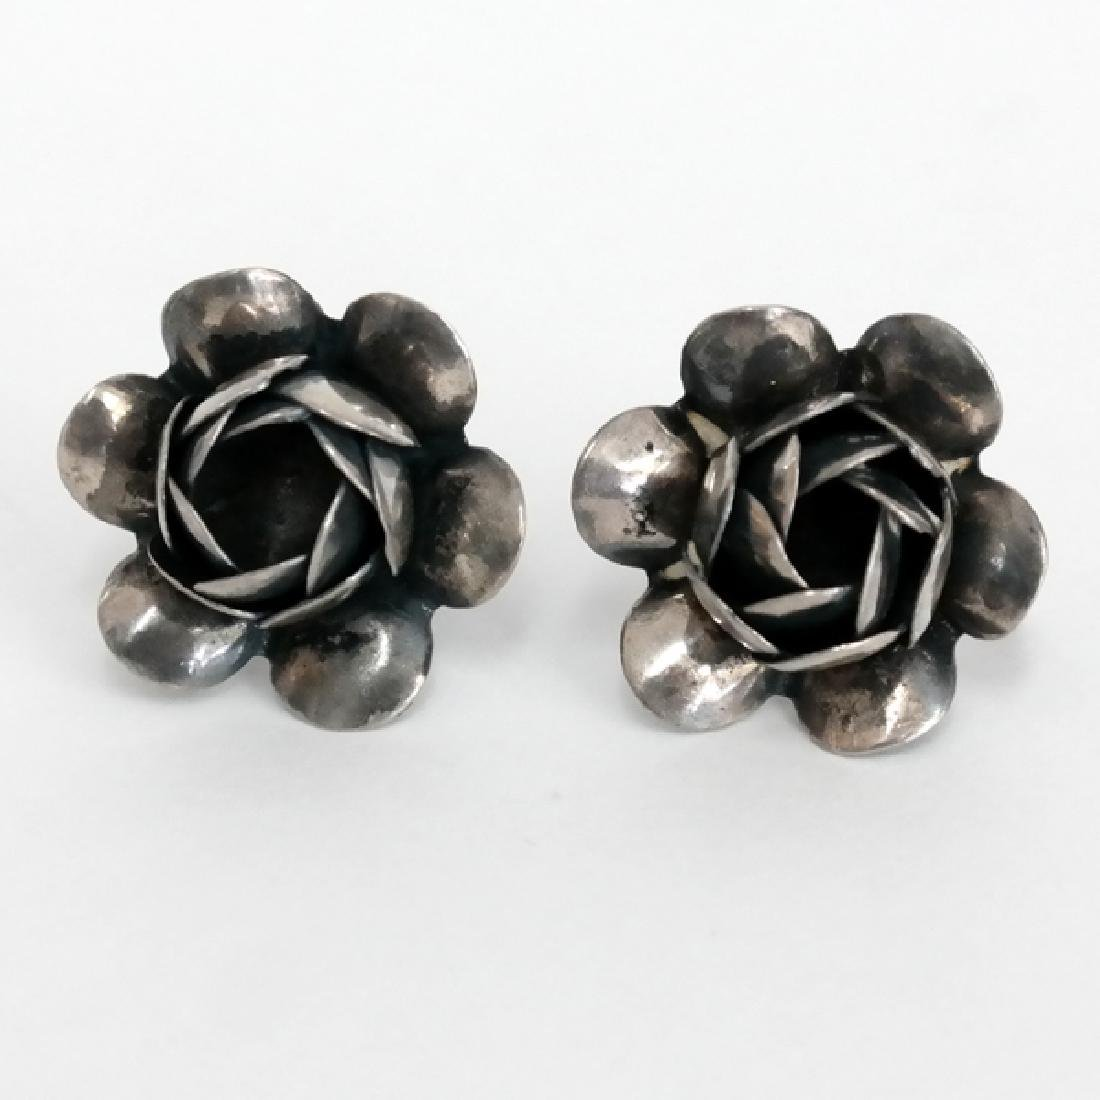 Vintage oxidised sterling silver rose shape ear clips